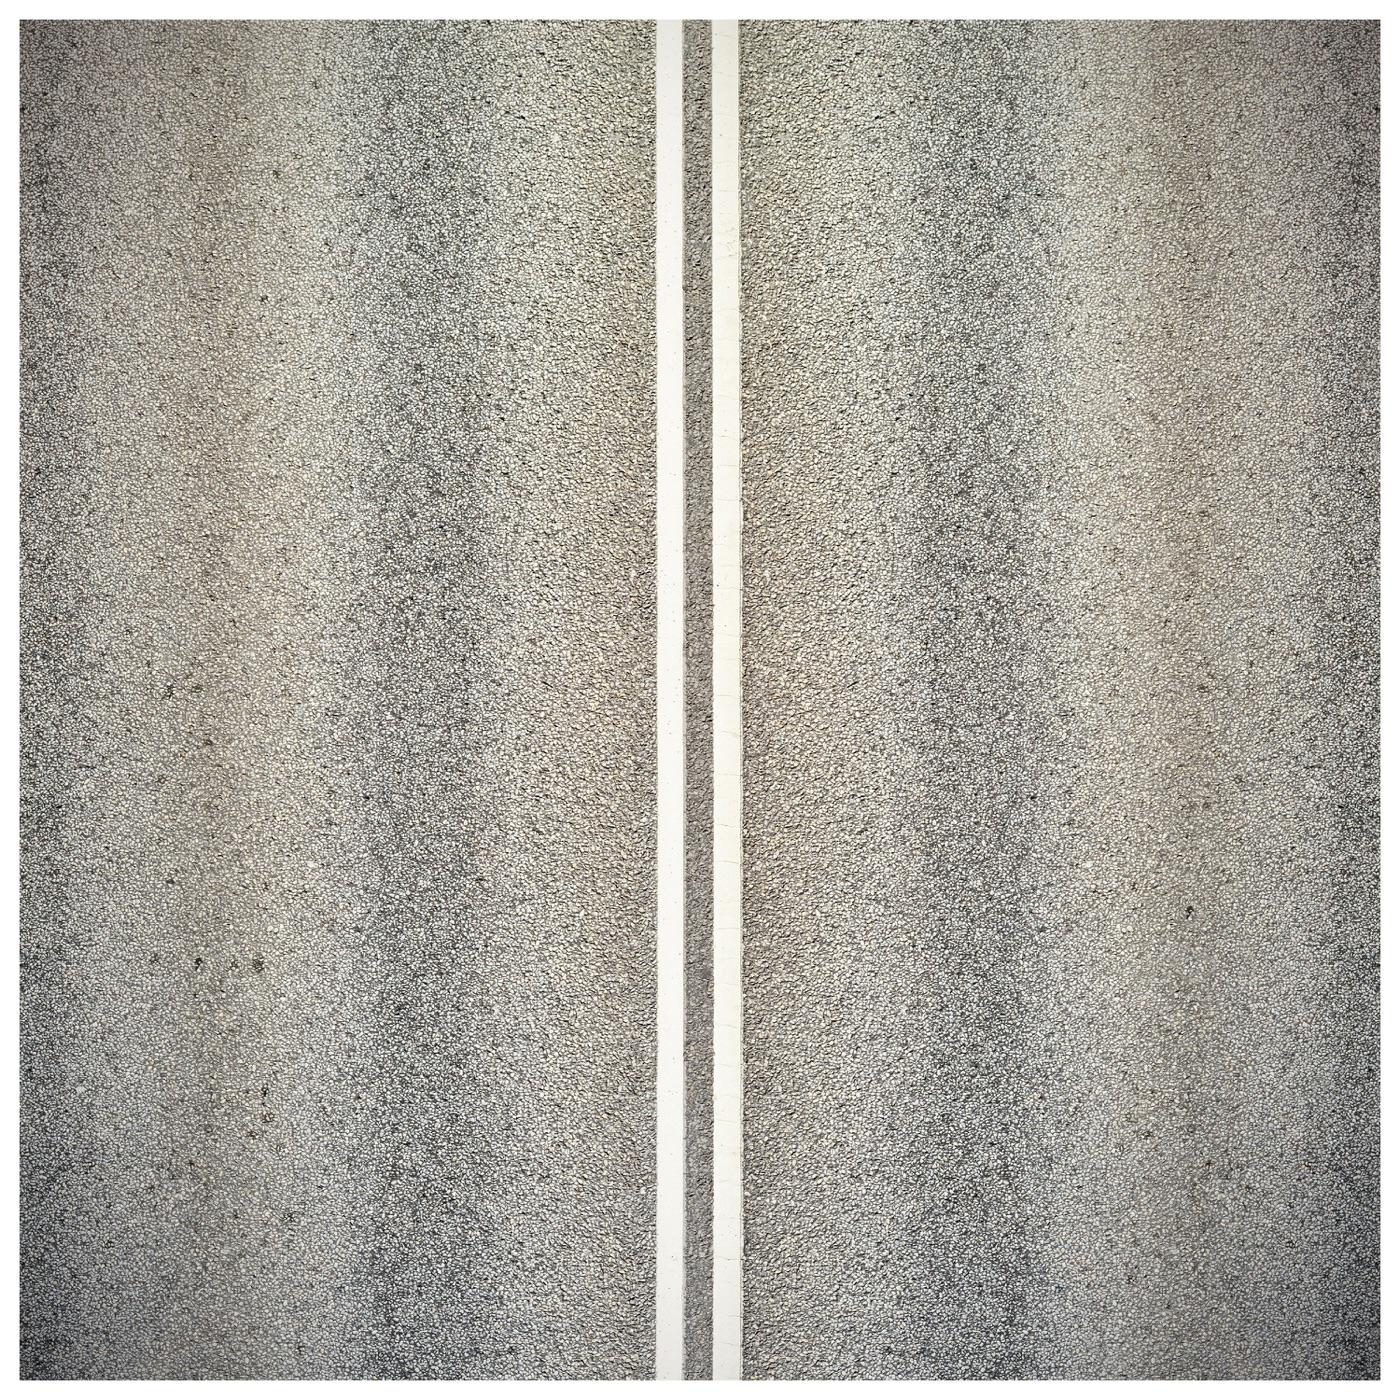 Sam Hunt - Body Like a Back Road - Single